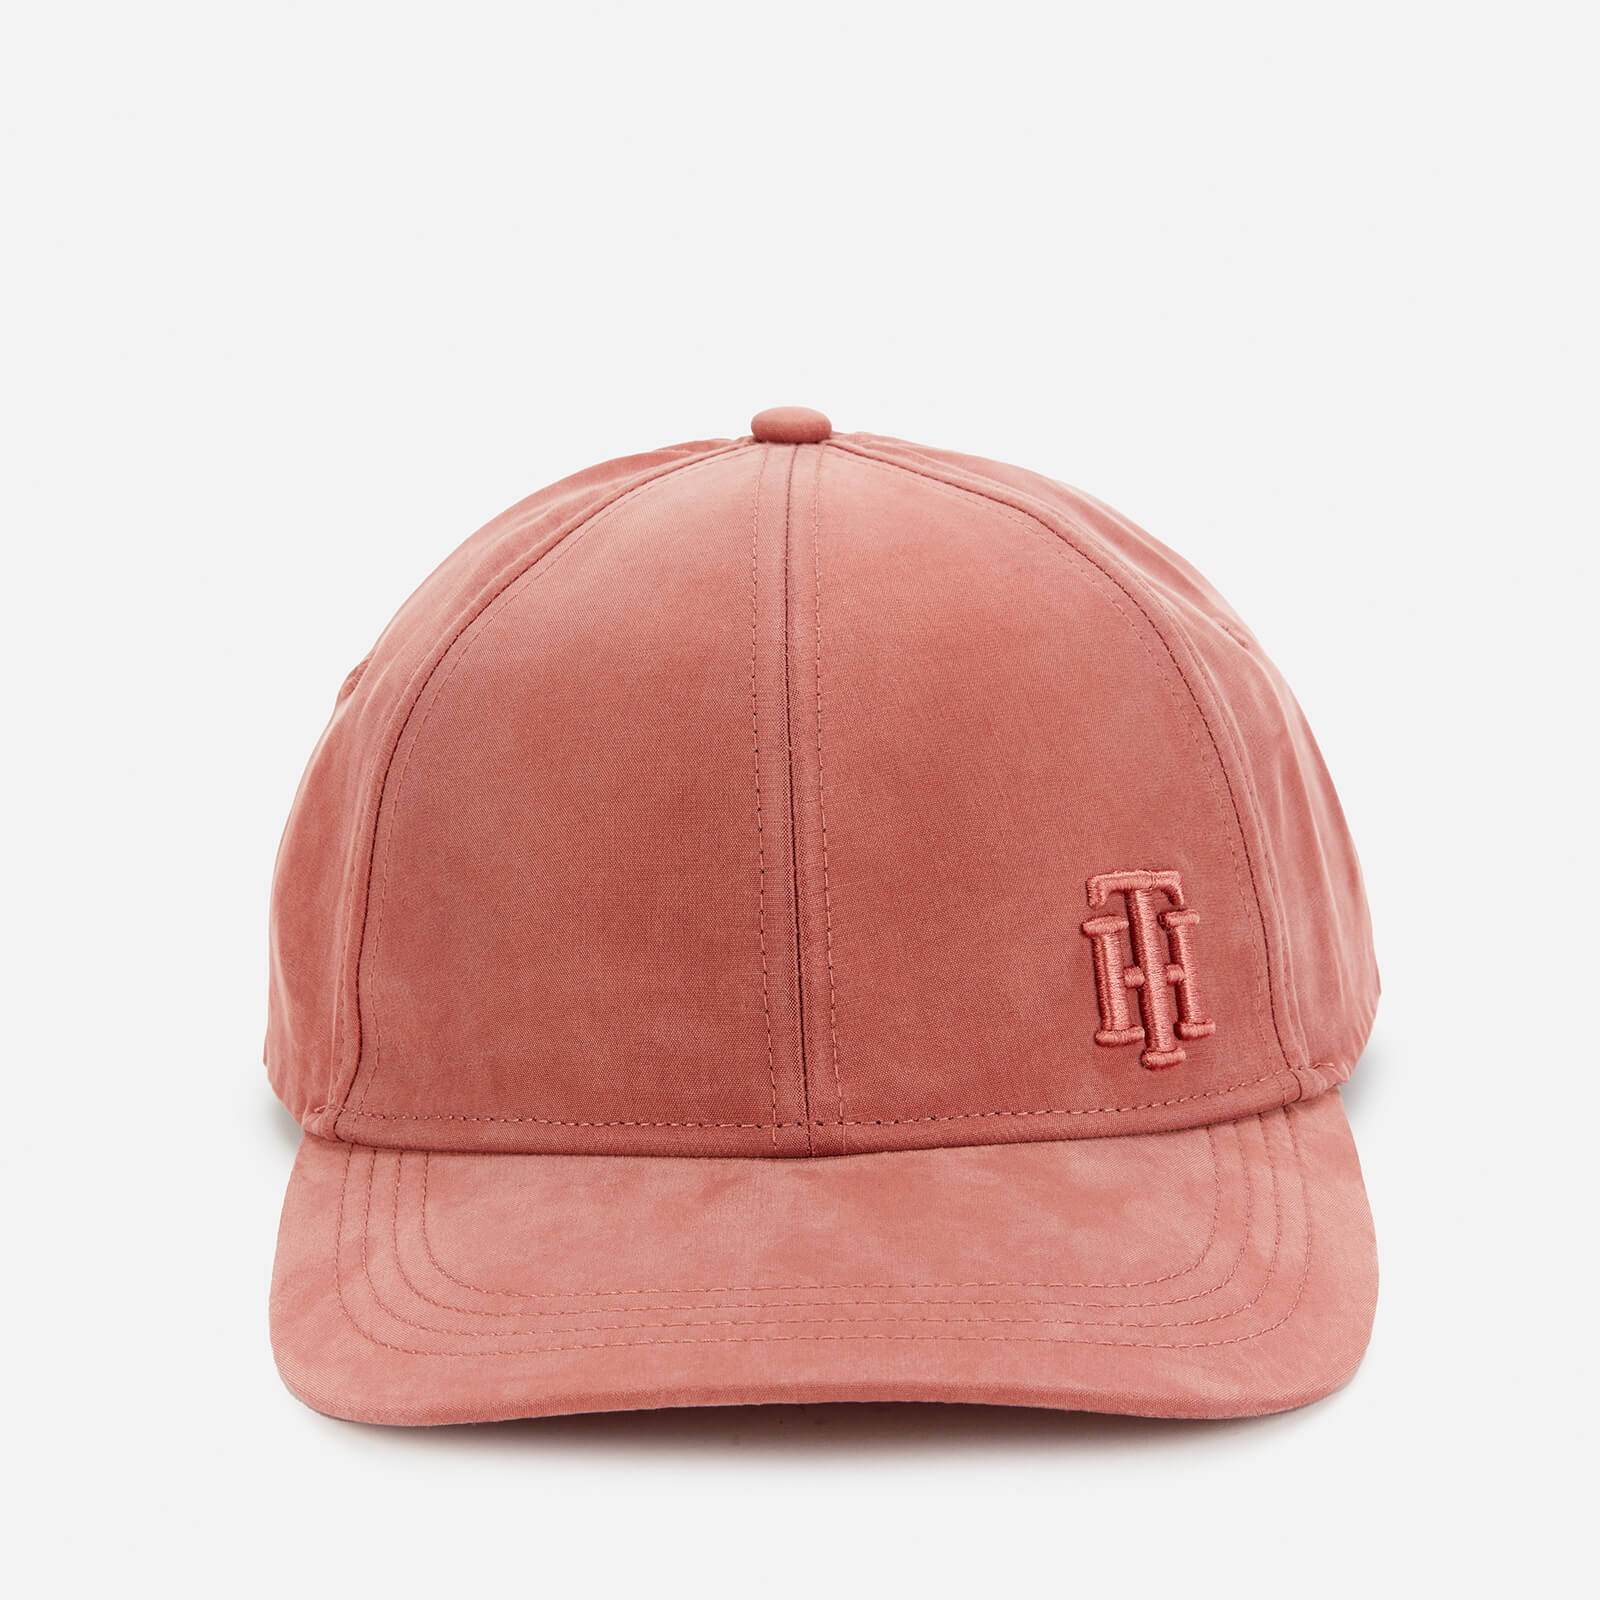 Tommy Hilfiger Women's TH Logo Baseball Cap - Mineralize